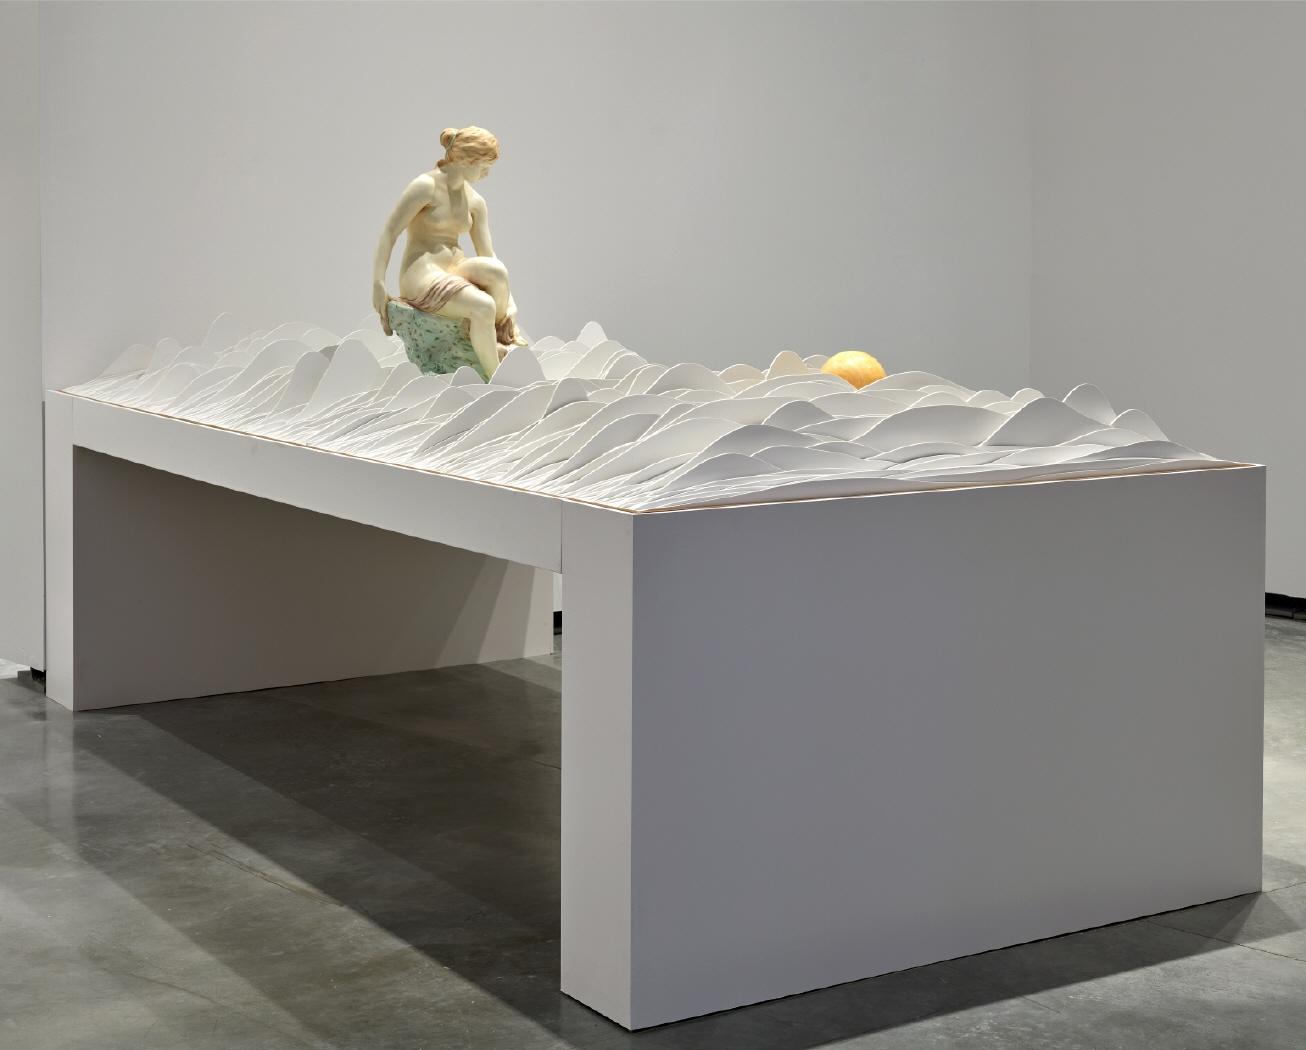 Le Bain Animique, 2010